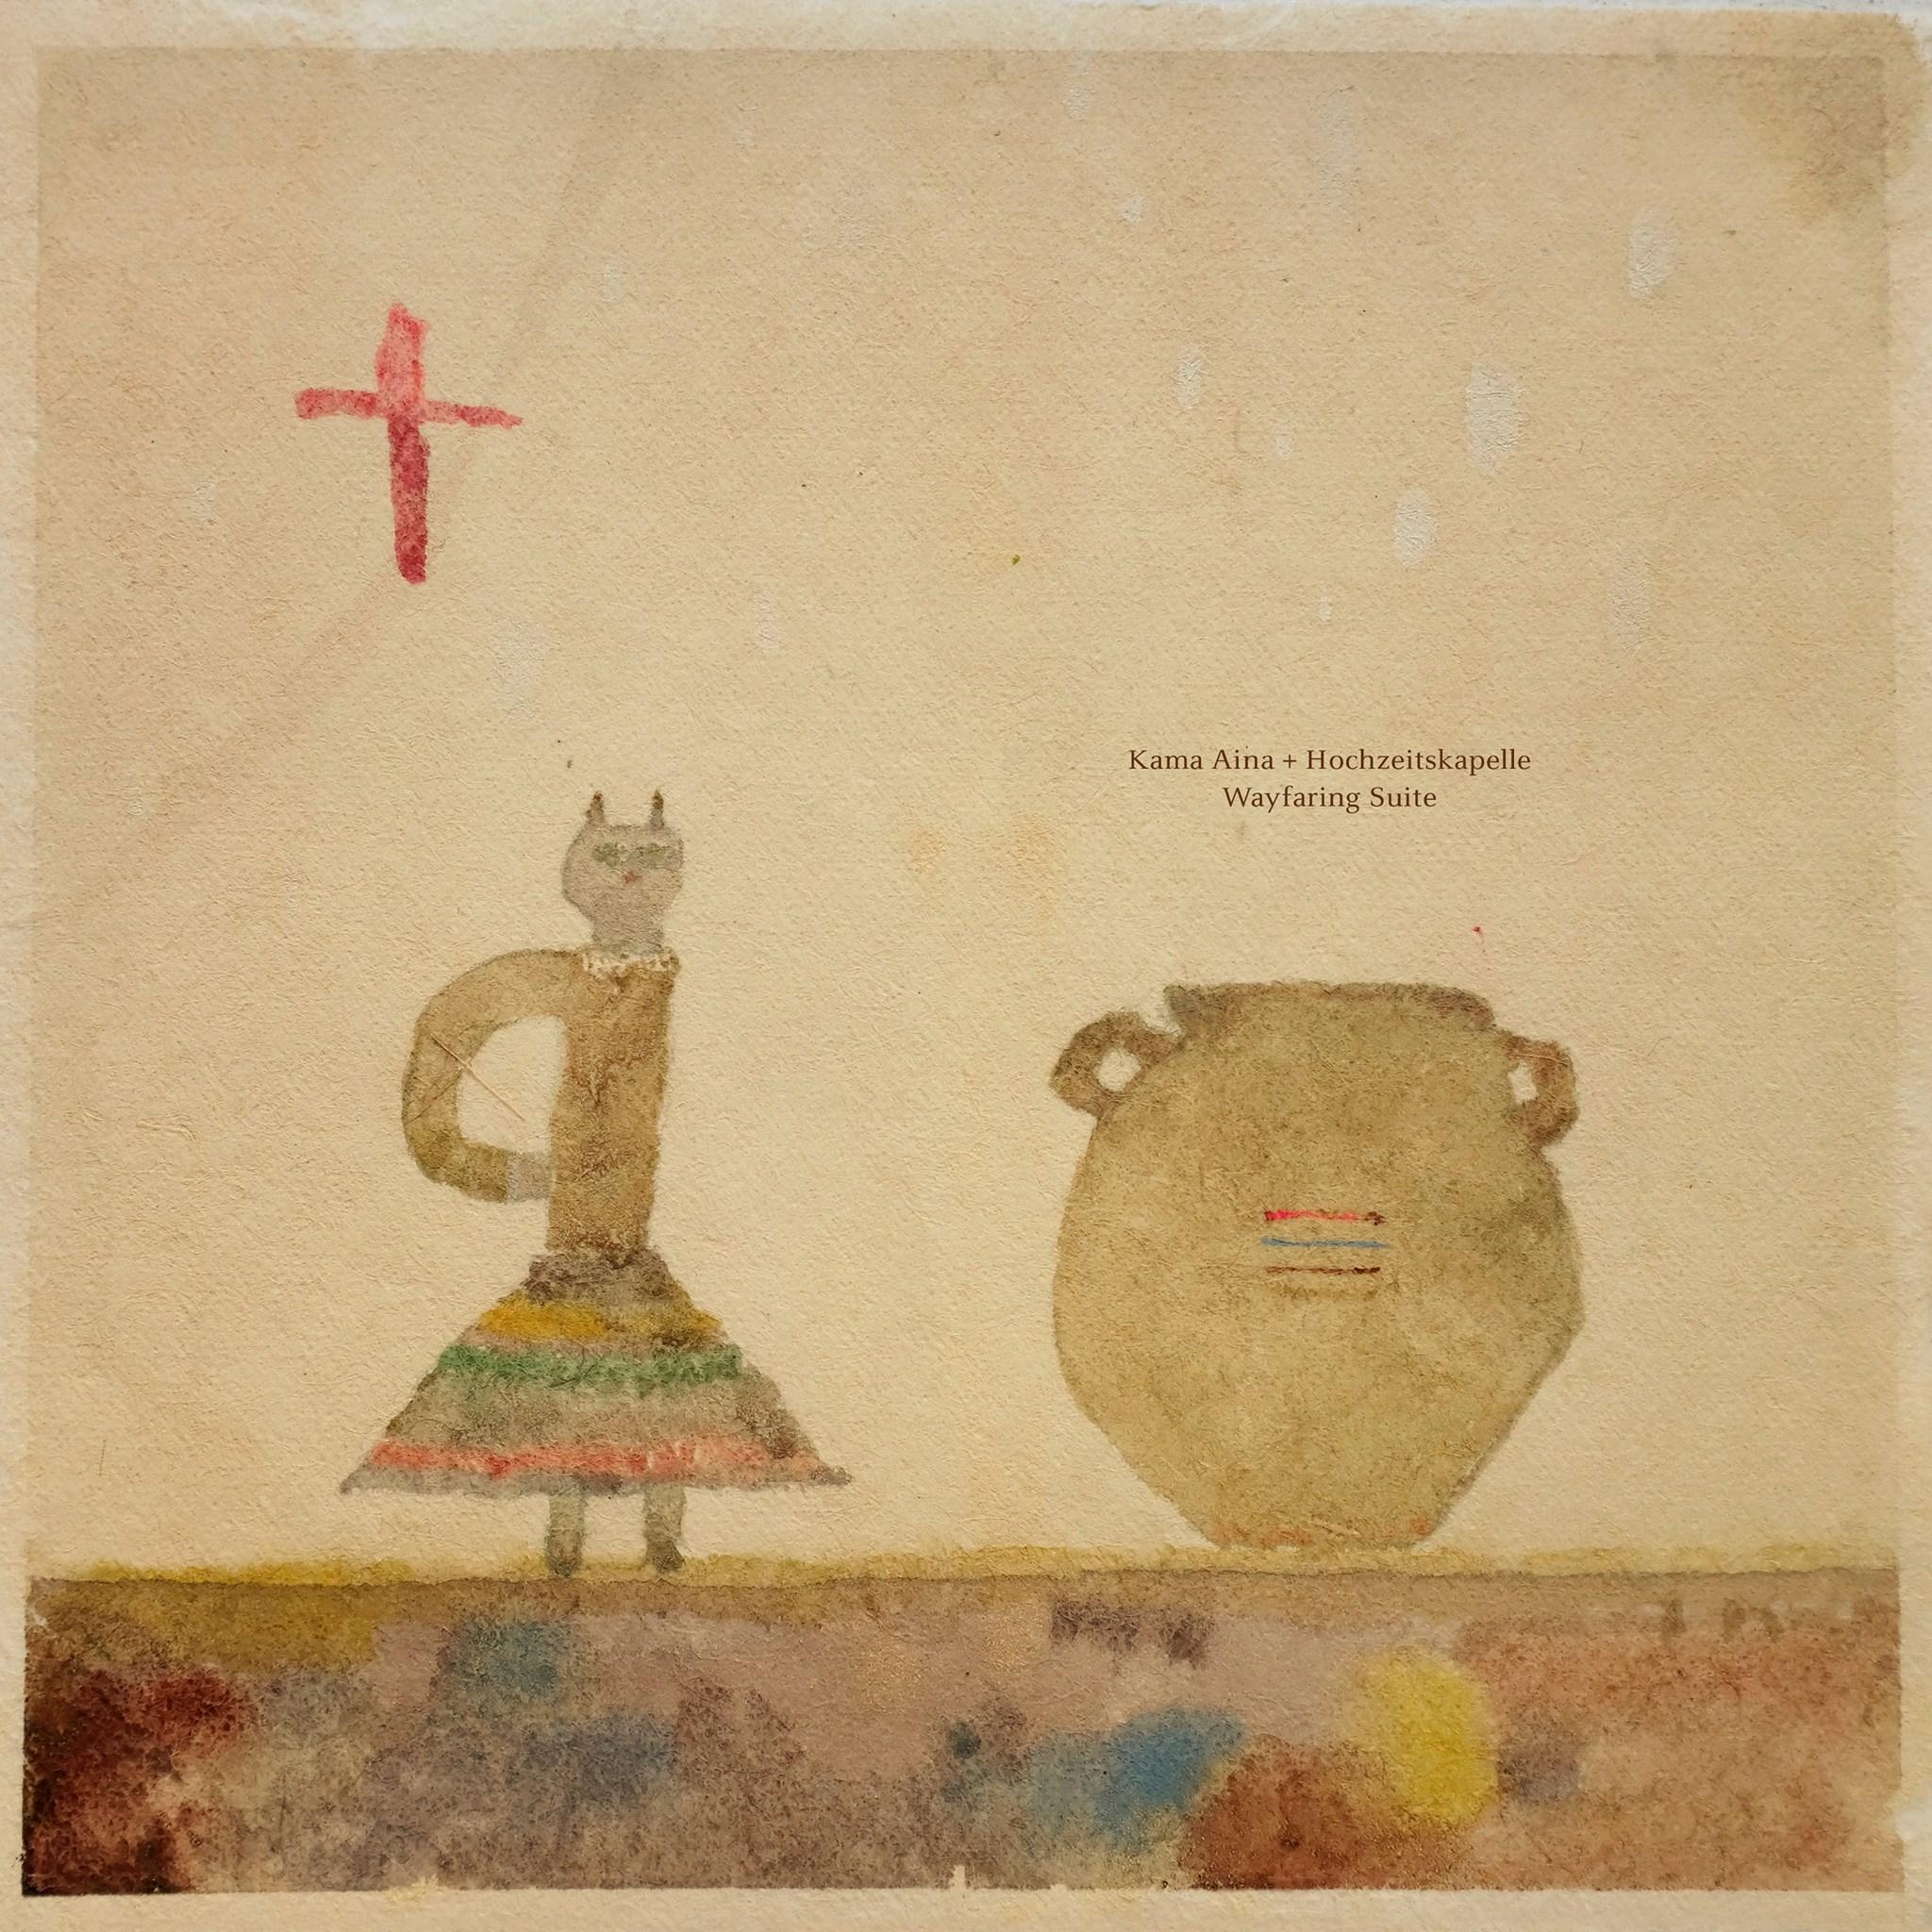 Hochzeit Kapelle/Kama Aina - Wayfaring Suite 7 - fanzine